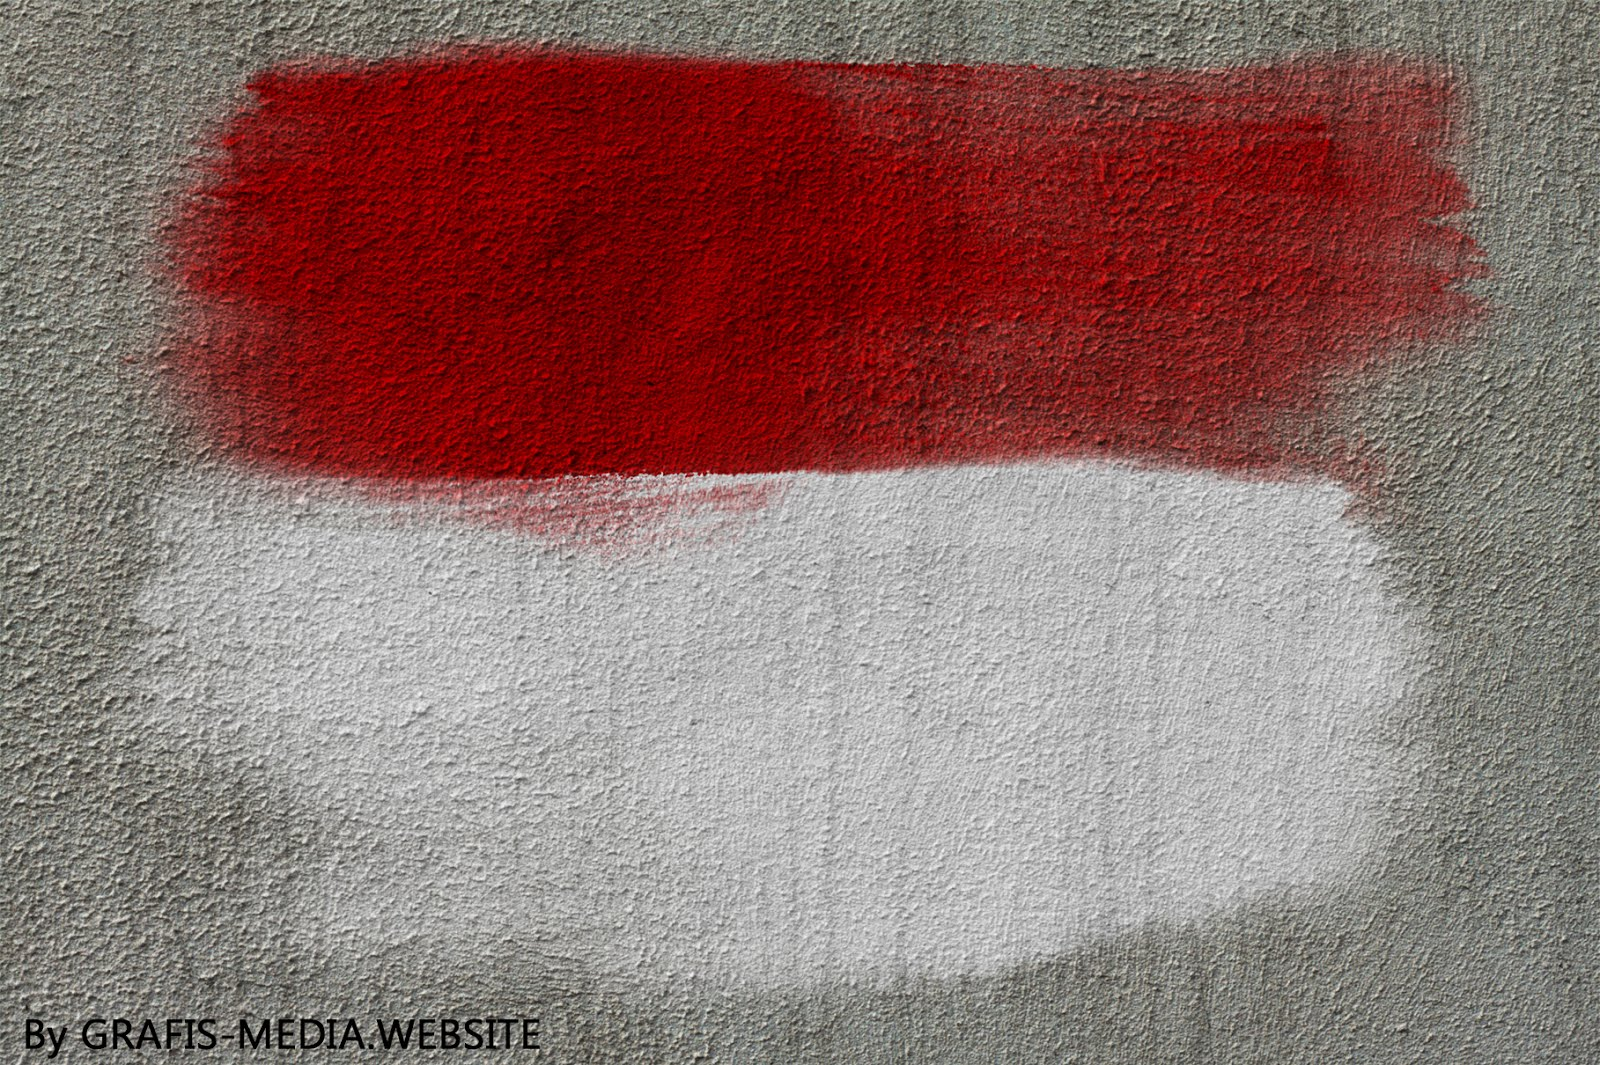 Ukuran Bendera Merah Putih Untuk Halaman Rumah Soalan P